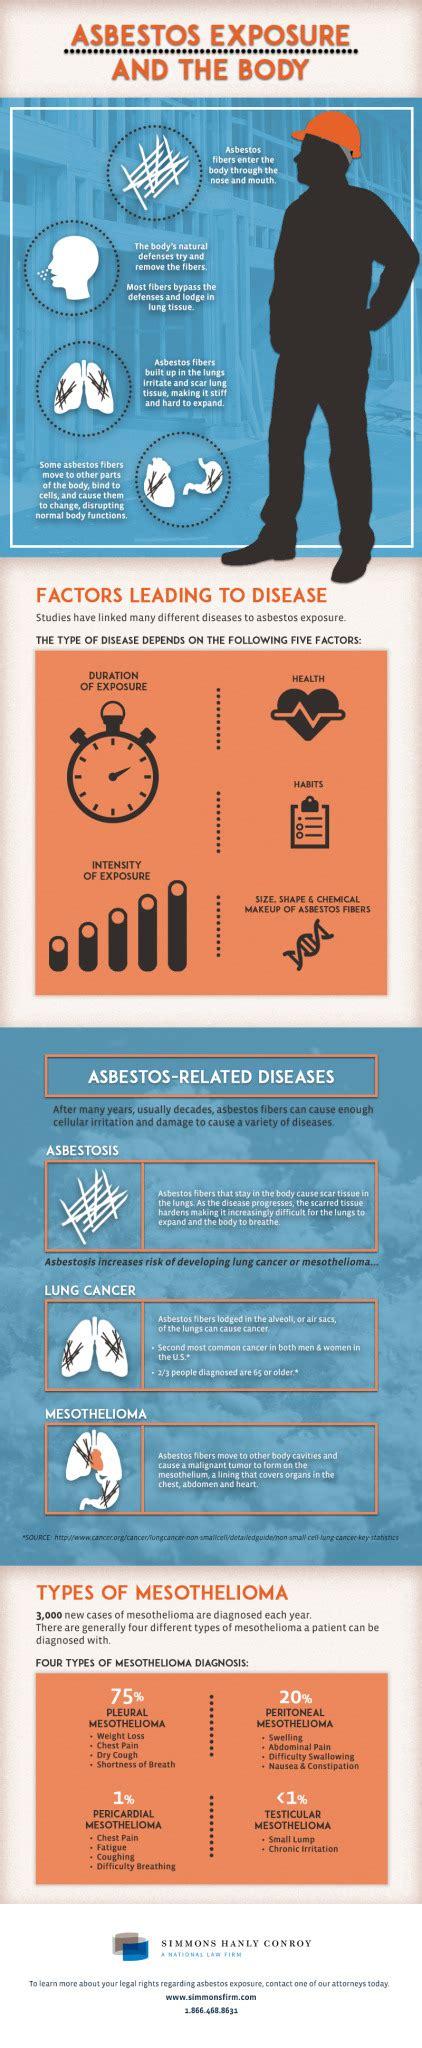 asbestos exposure   body infographic simmons